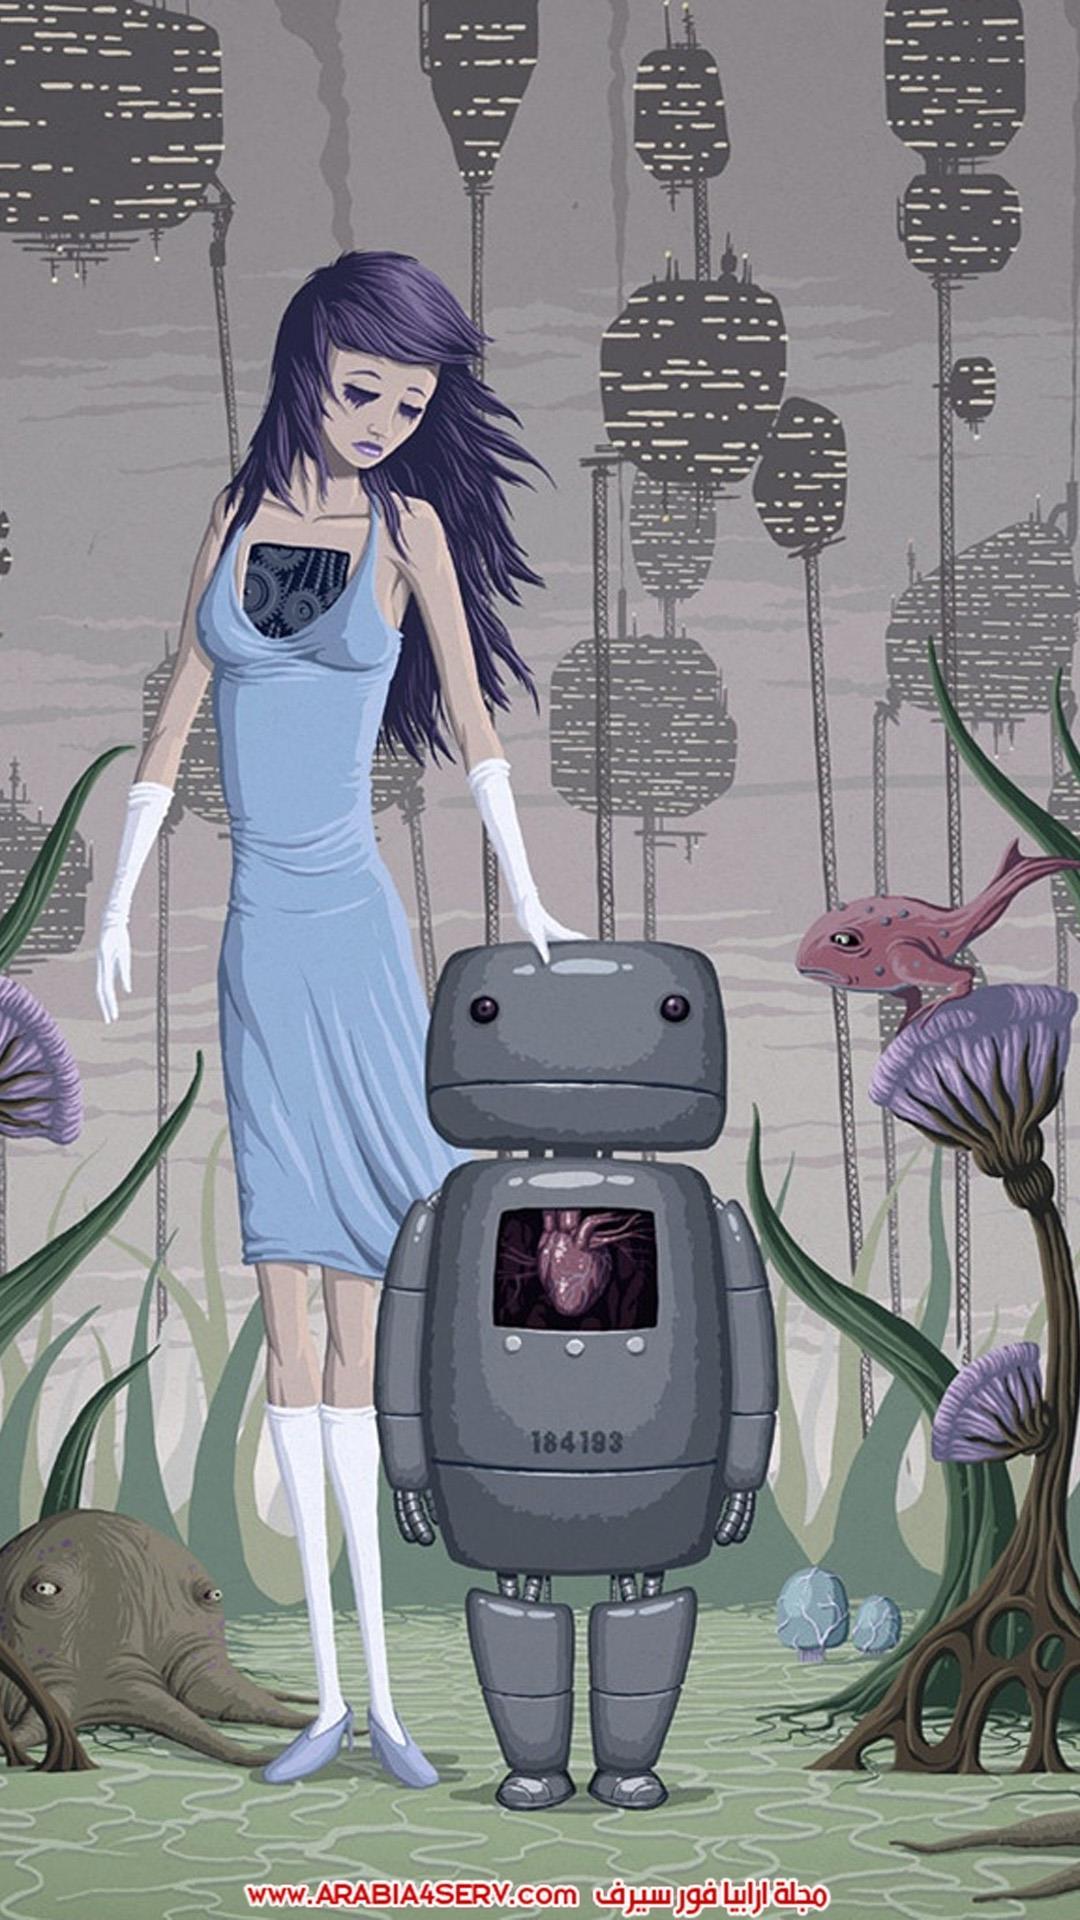 خلفيات-موبايل-جوال-نوكيا-لوميا-930-Nokia-Lumia-930-6